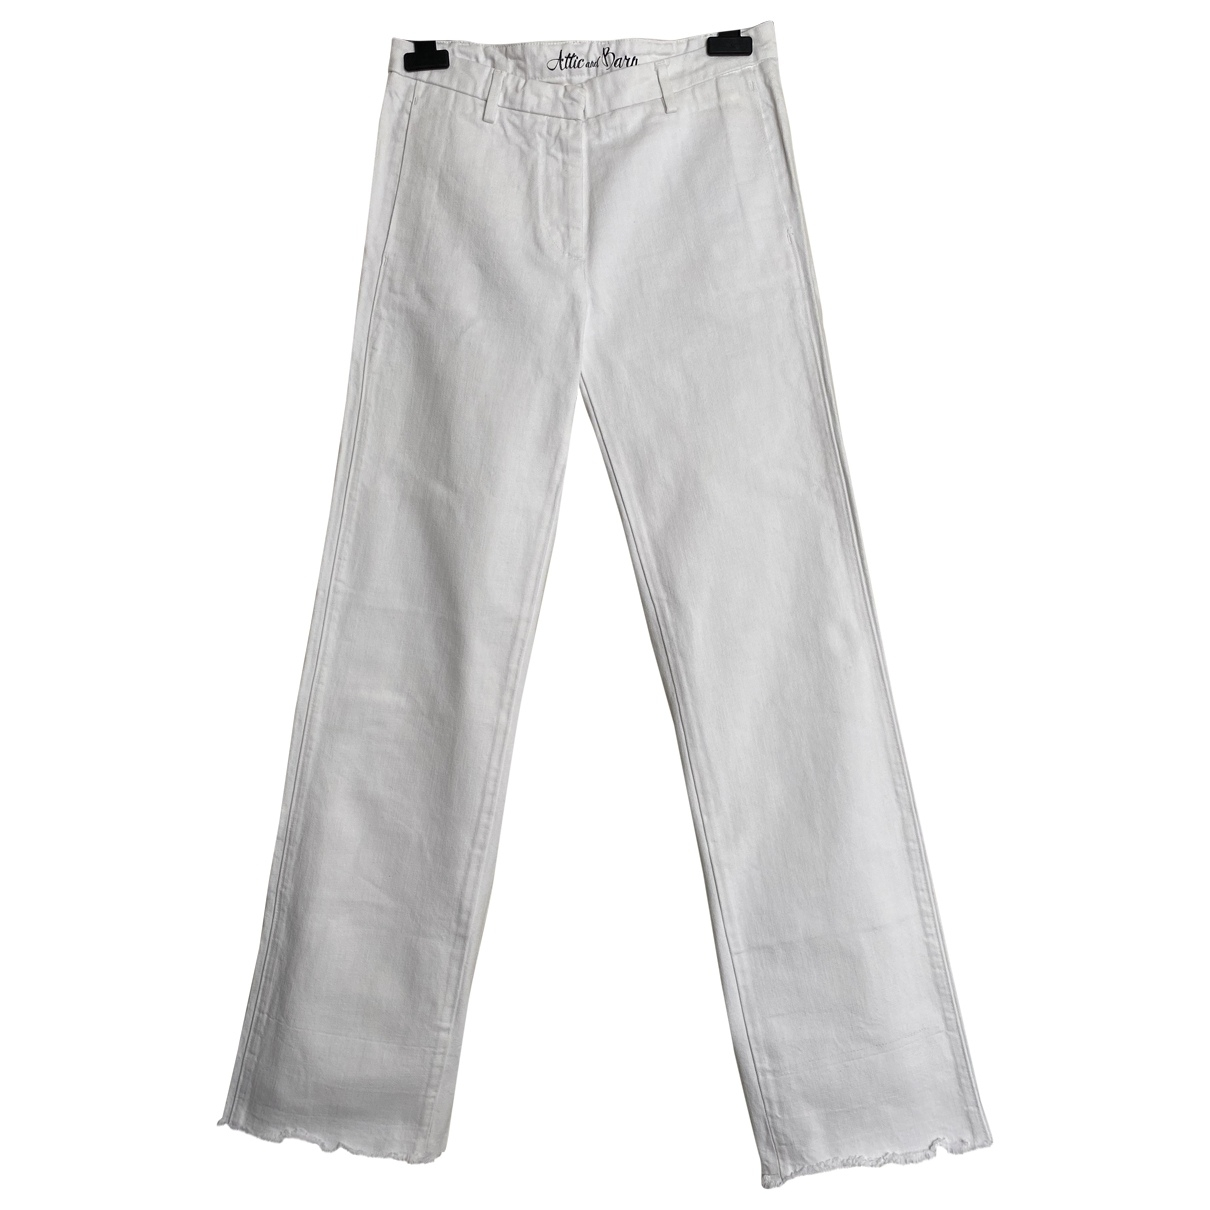 Pantalon recto Attic And Barn